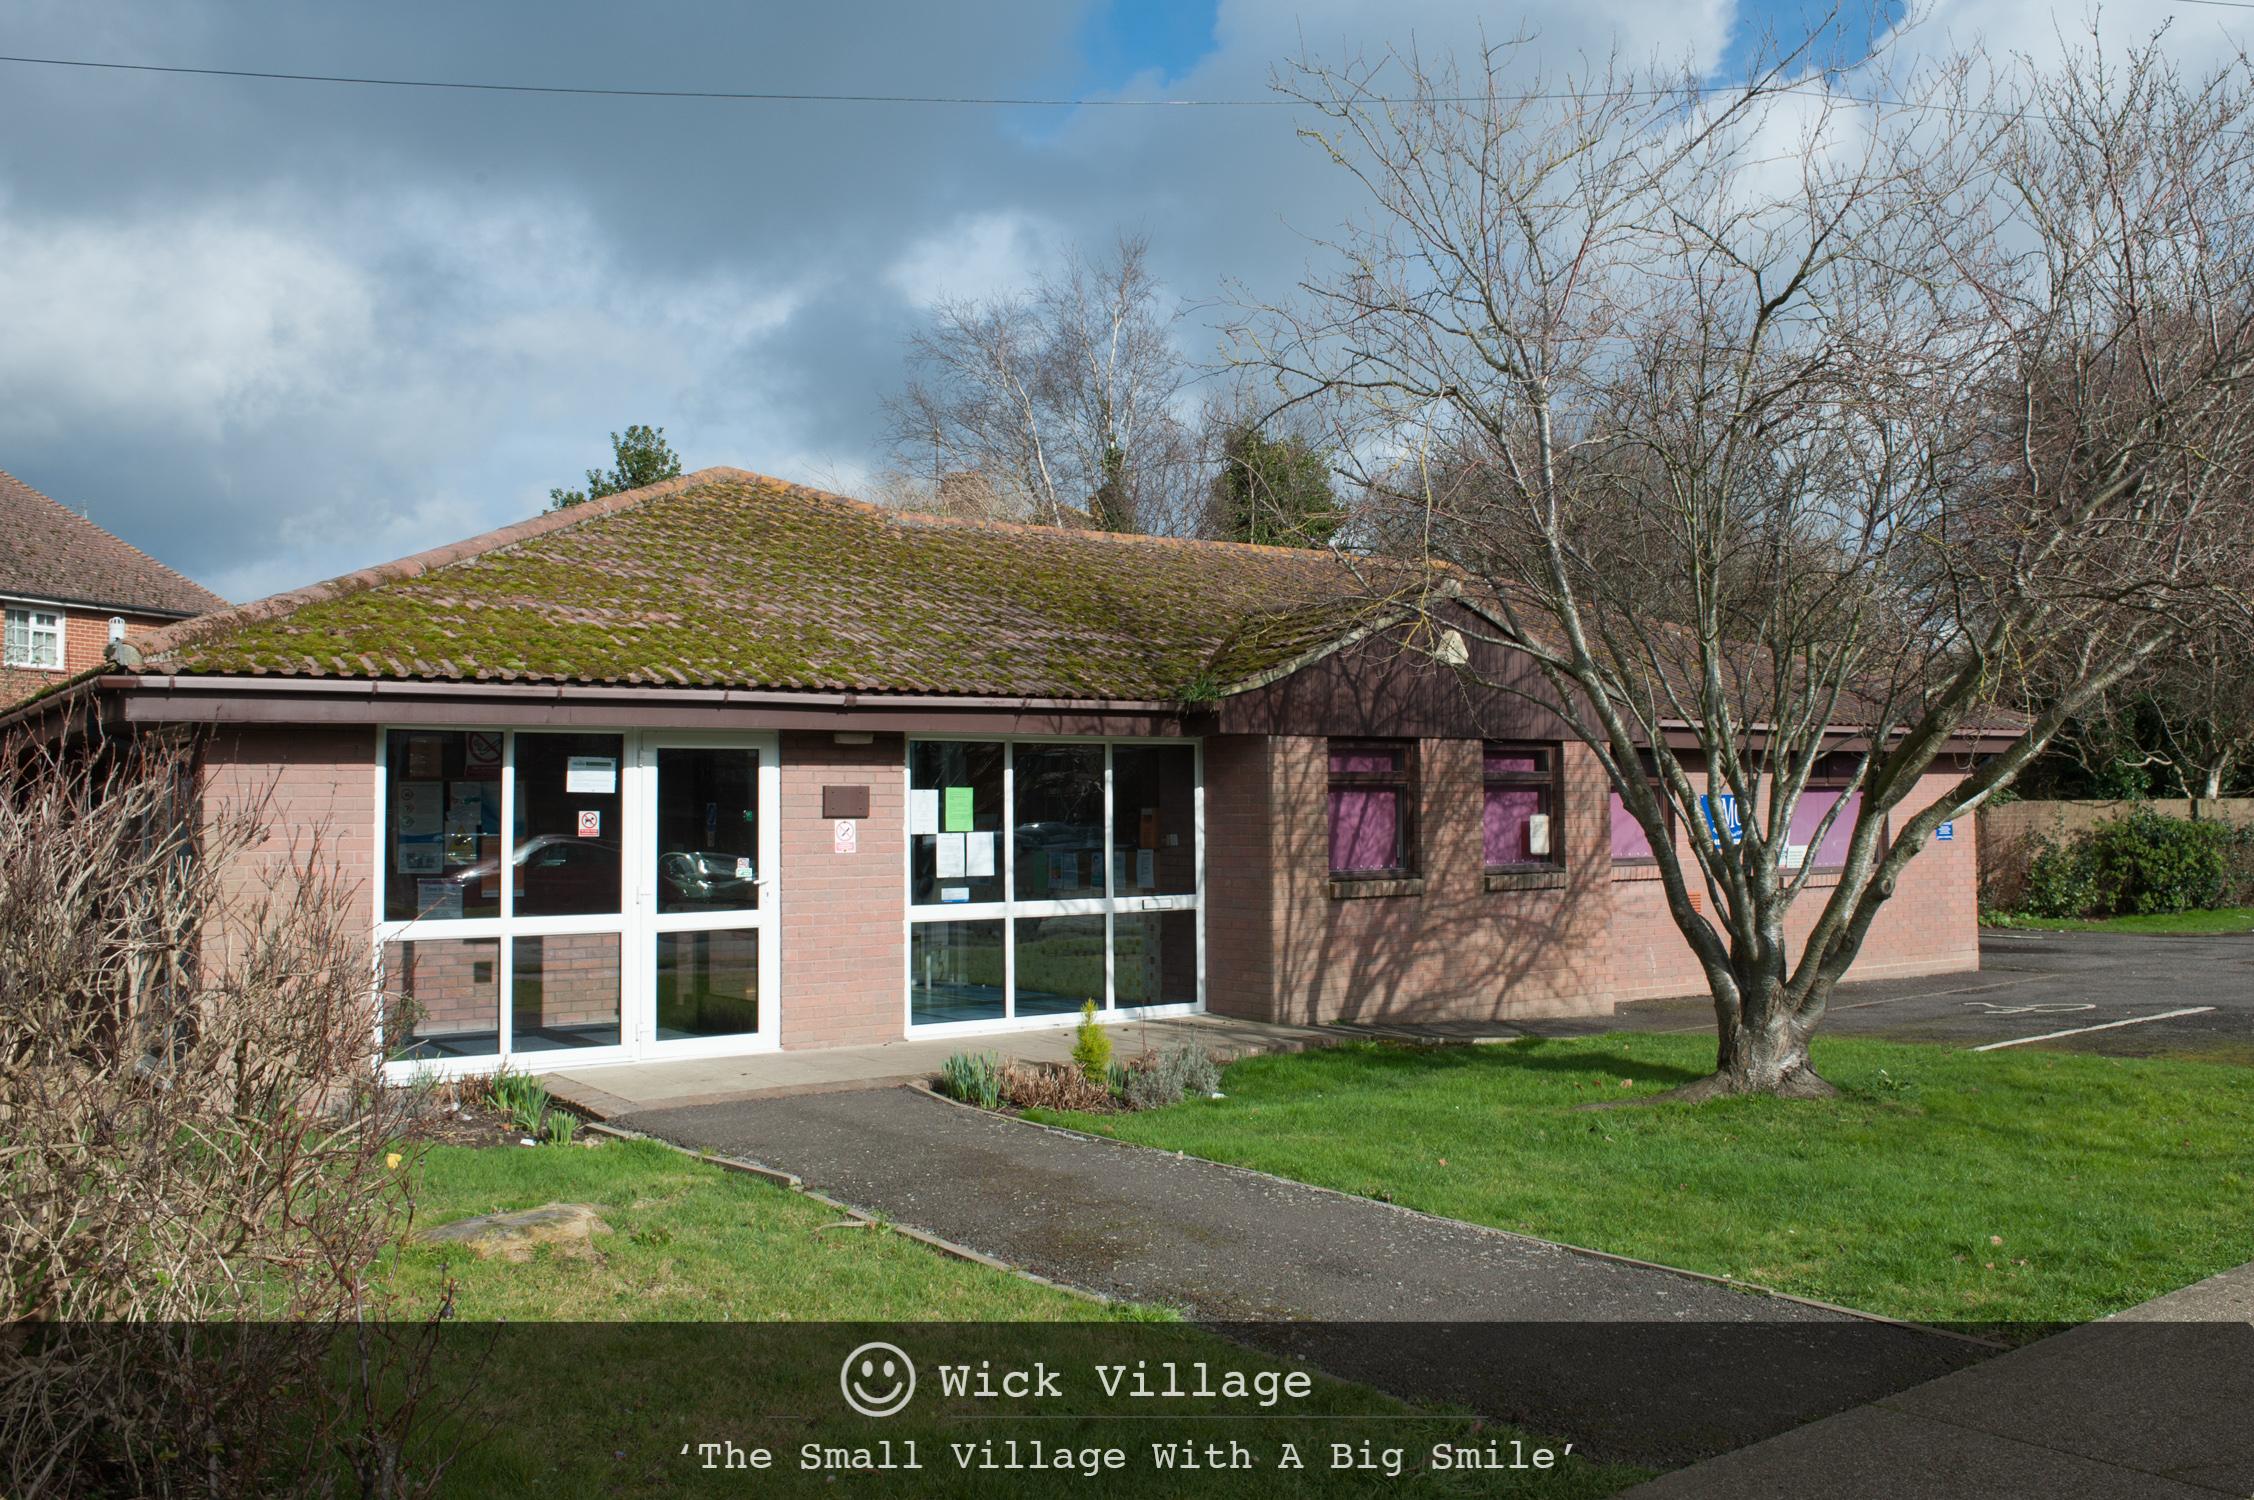 Wick Surgery, Wick Village, Littlehampton.